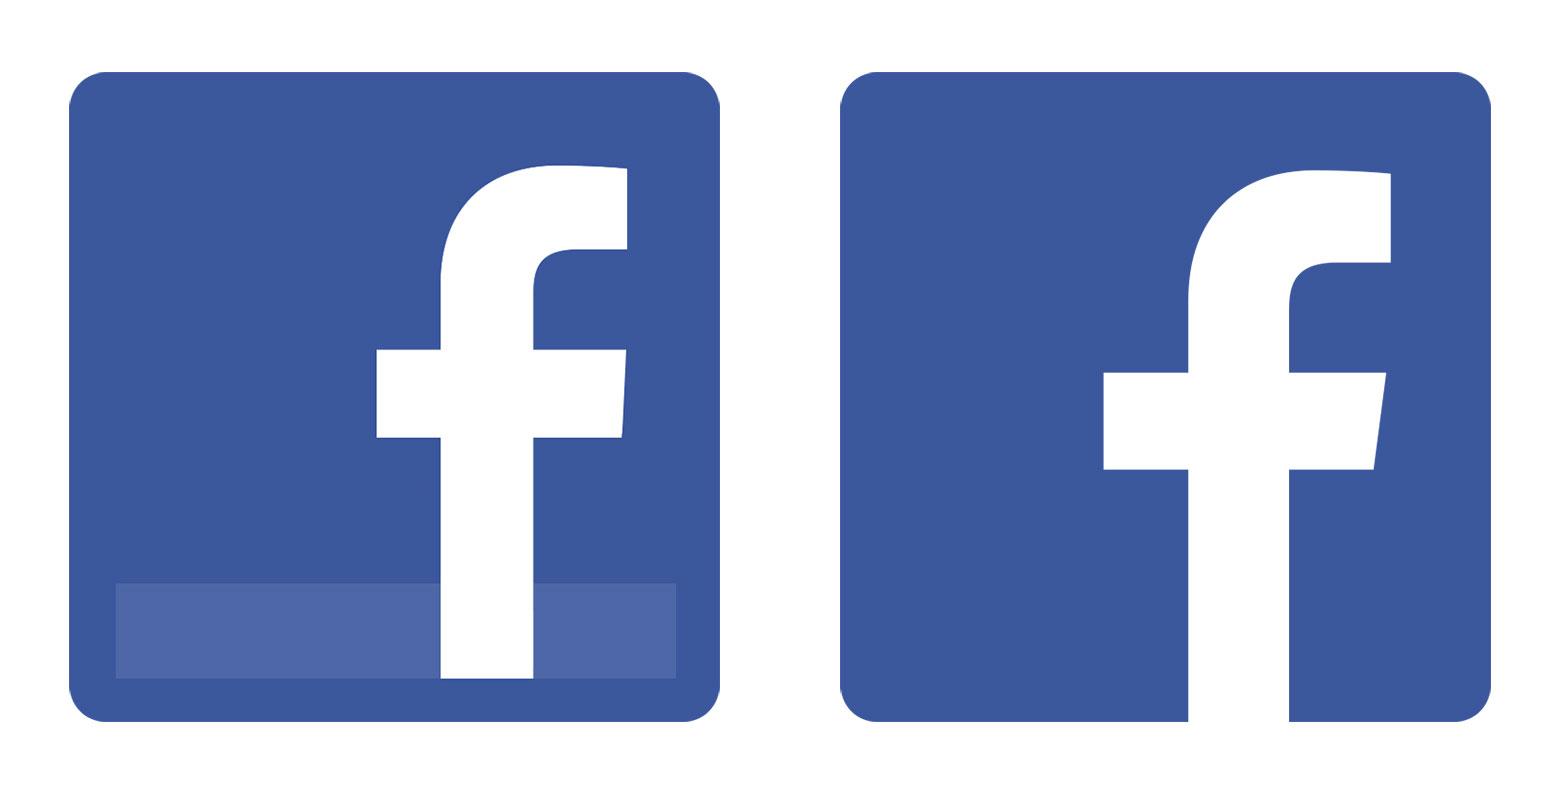 Clip art for facebook clipart